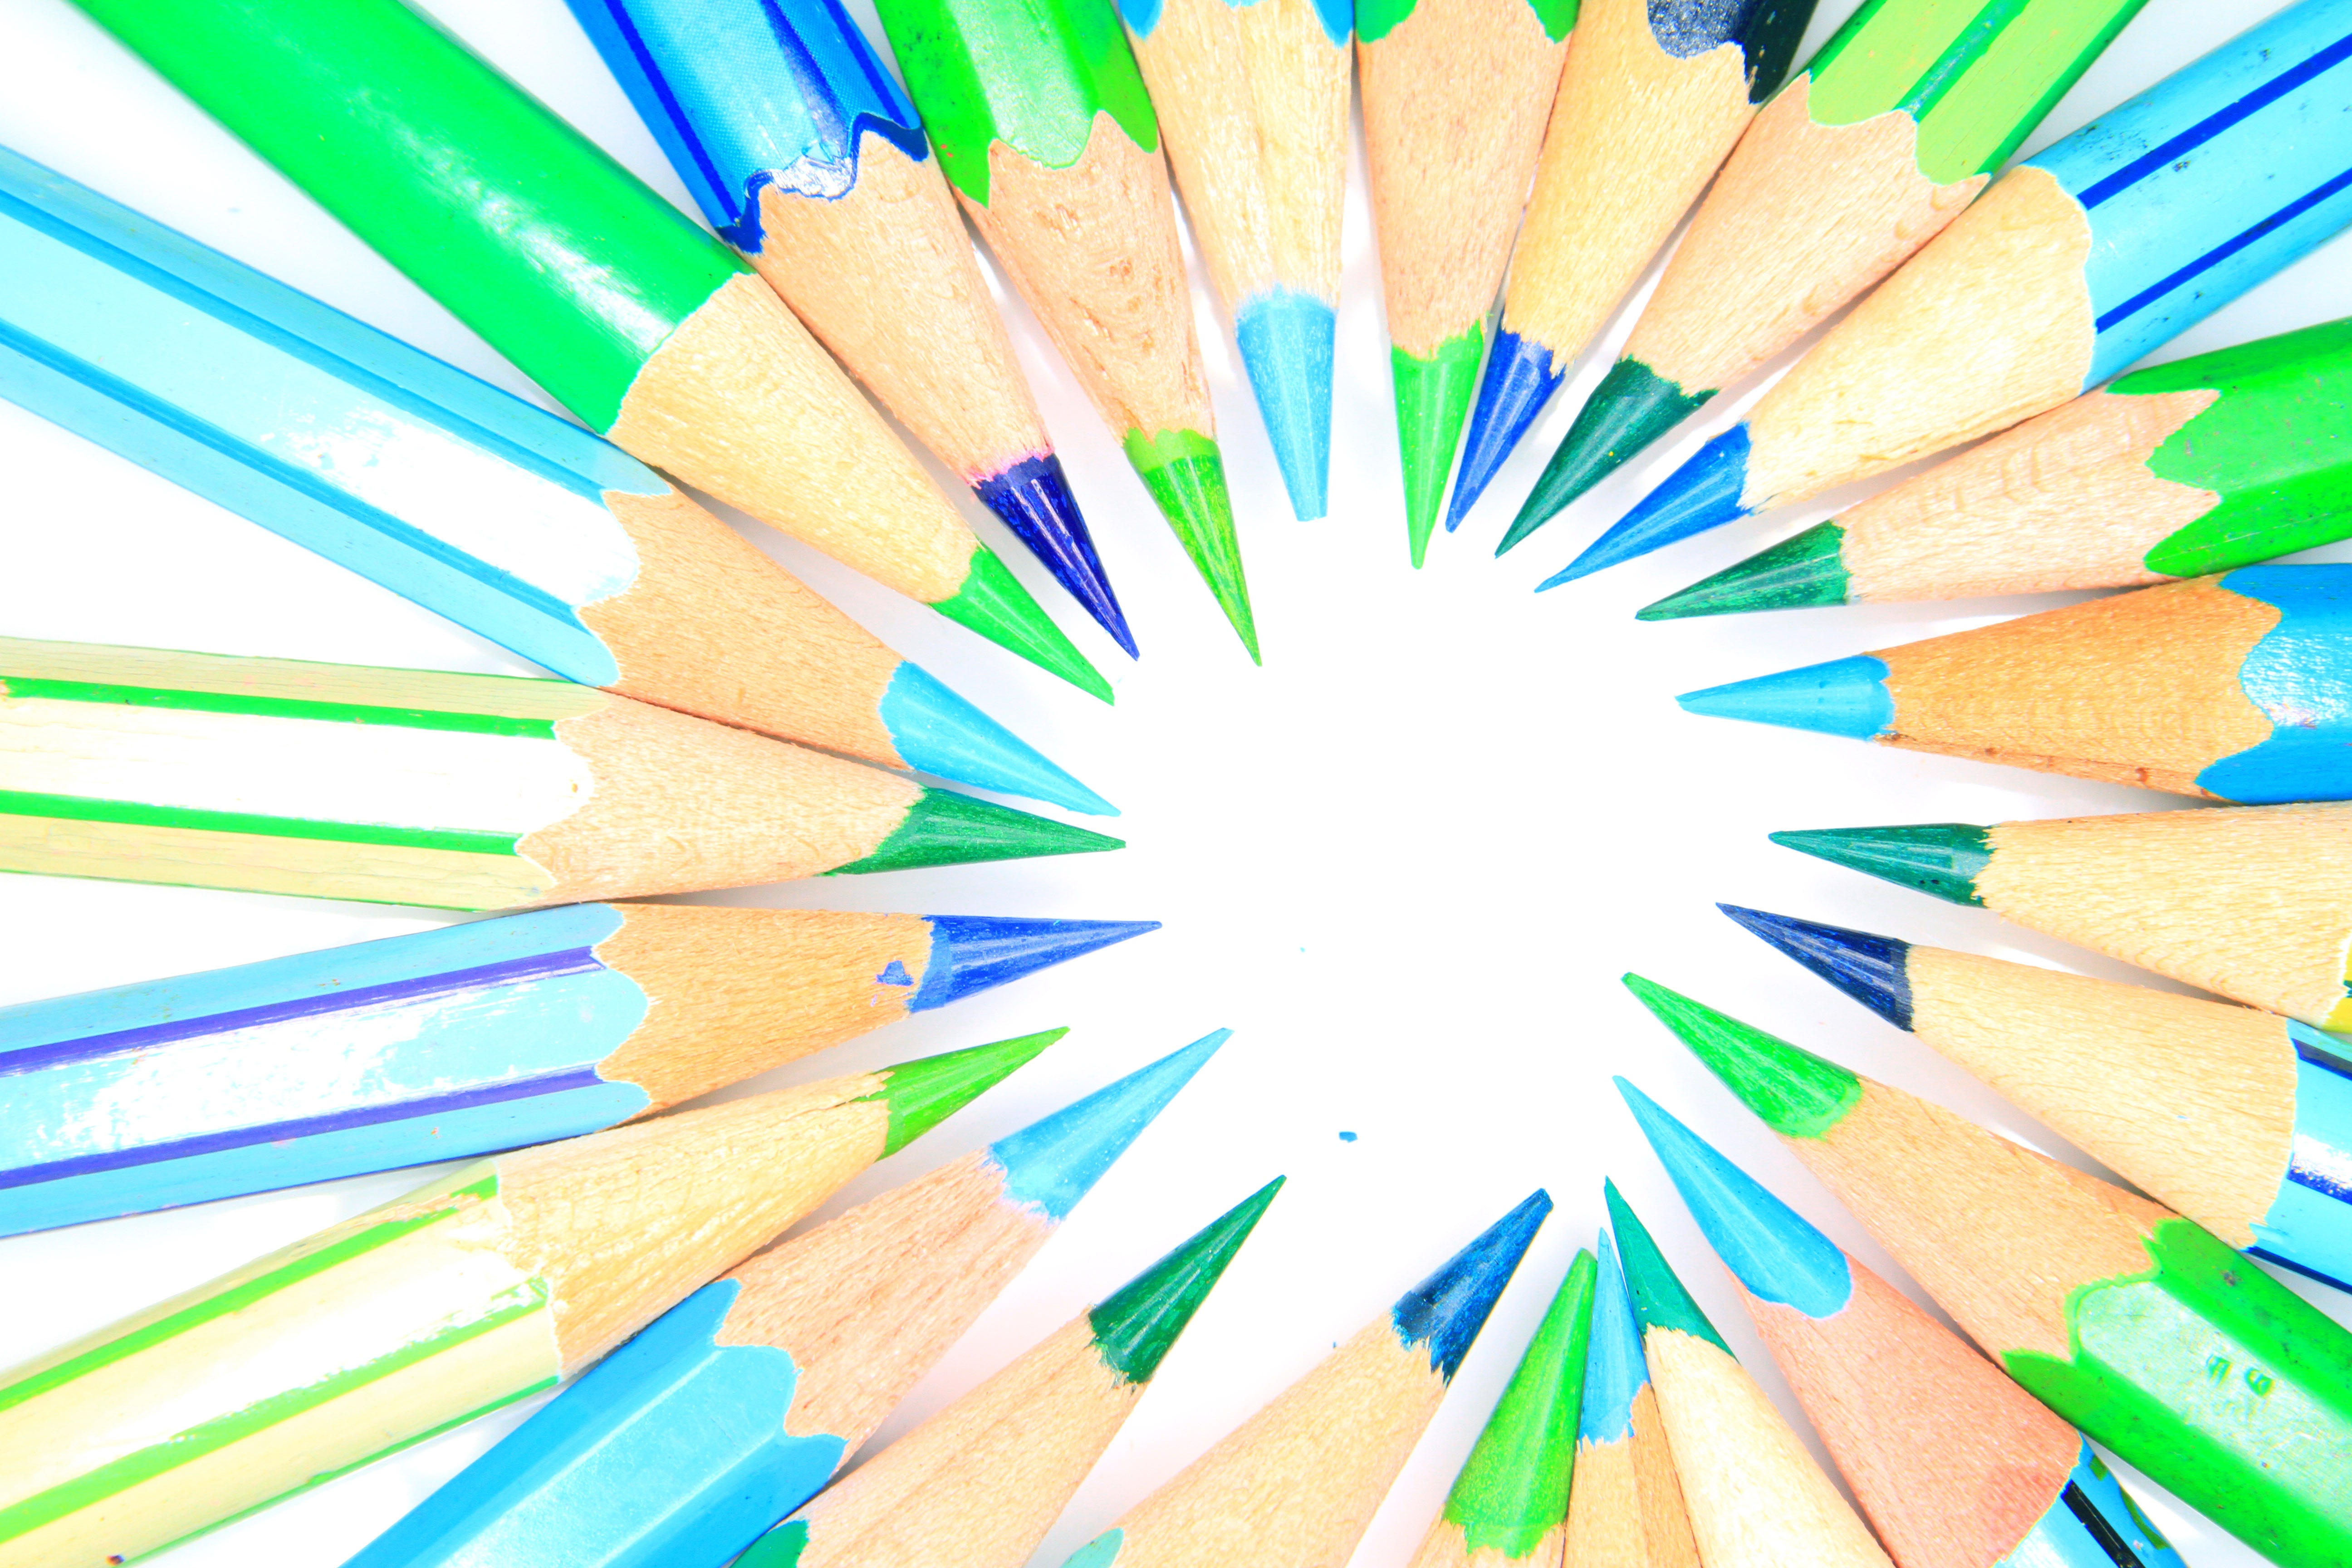 5184x3456 Free Images Sharp, Group, Wood, White, Row, Pen, Tool, Orange